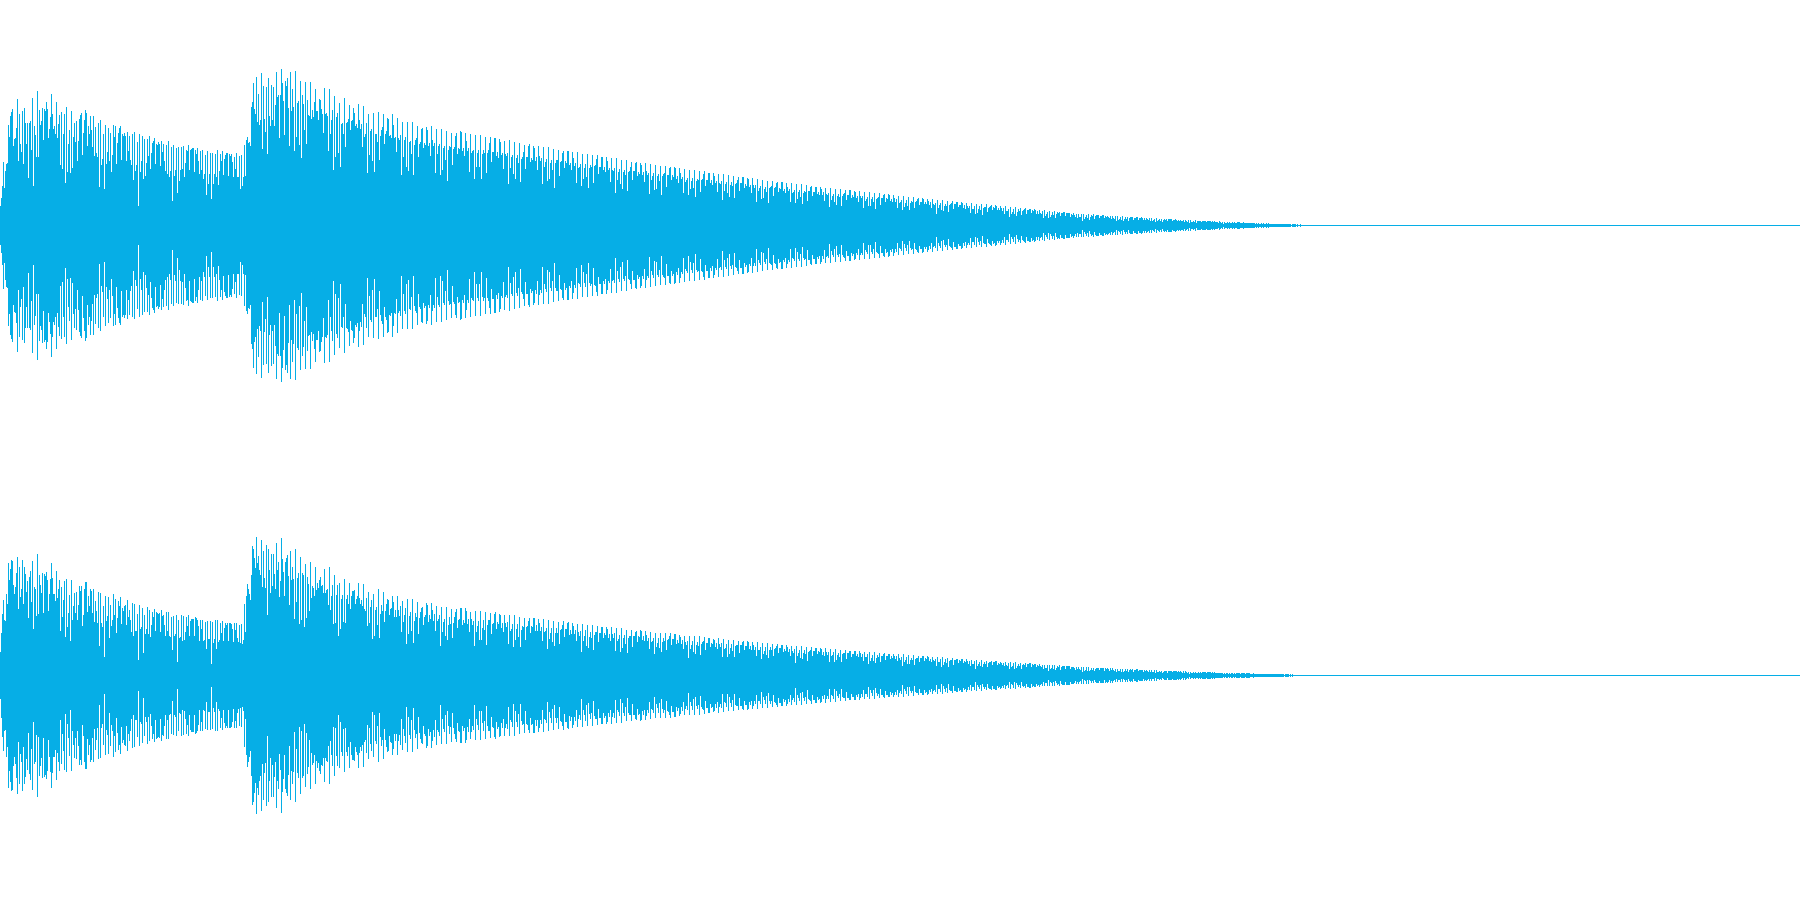 Parody スマホ音声アシスト 終了音の再生済みの波形